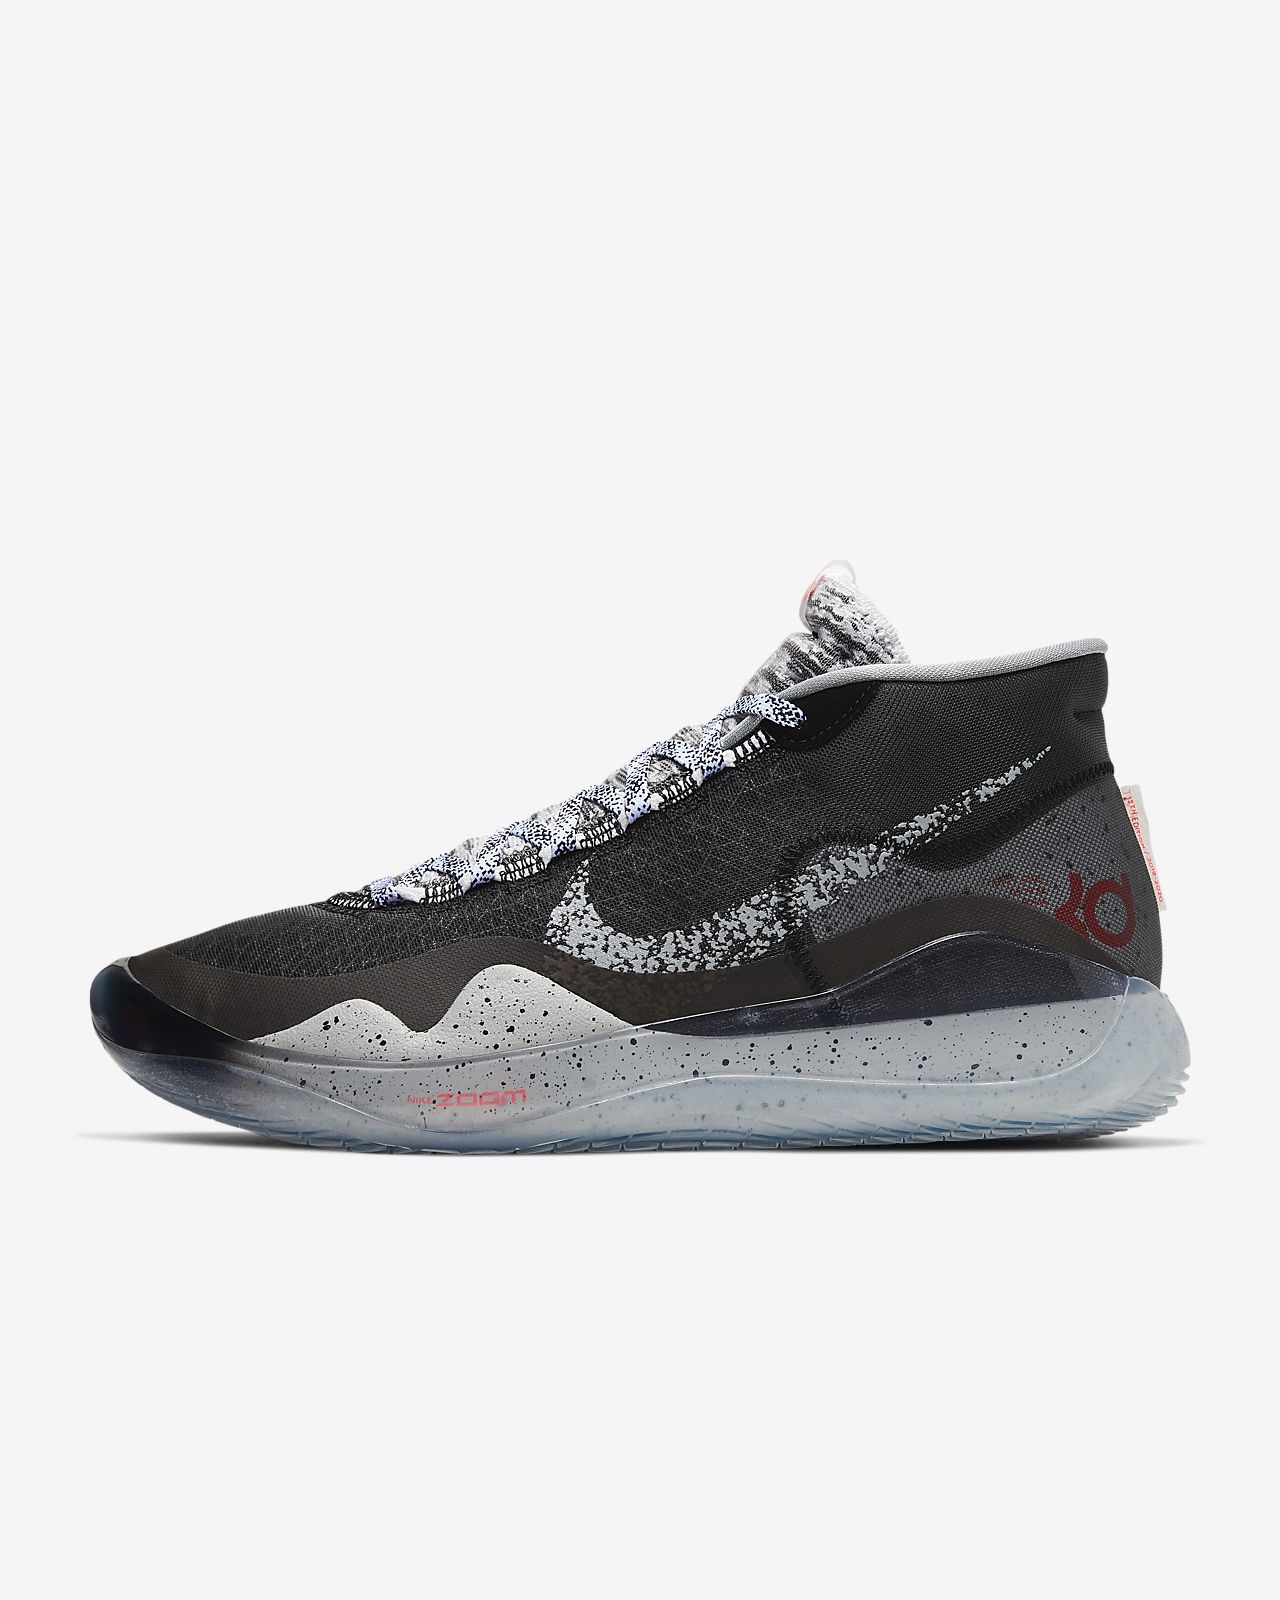 Sapatilhas de basquetebol Nike Zoom KD12